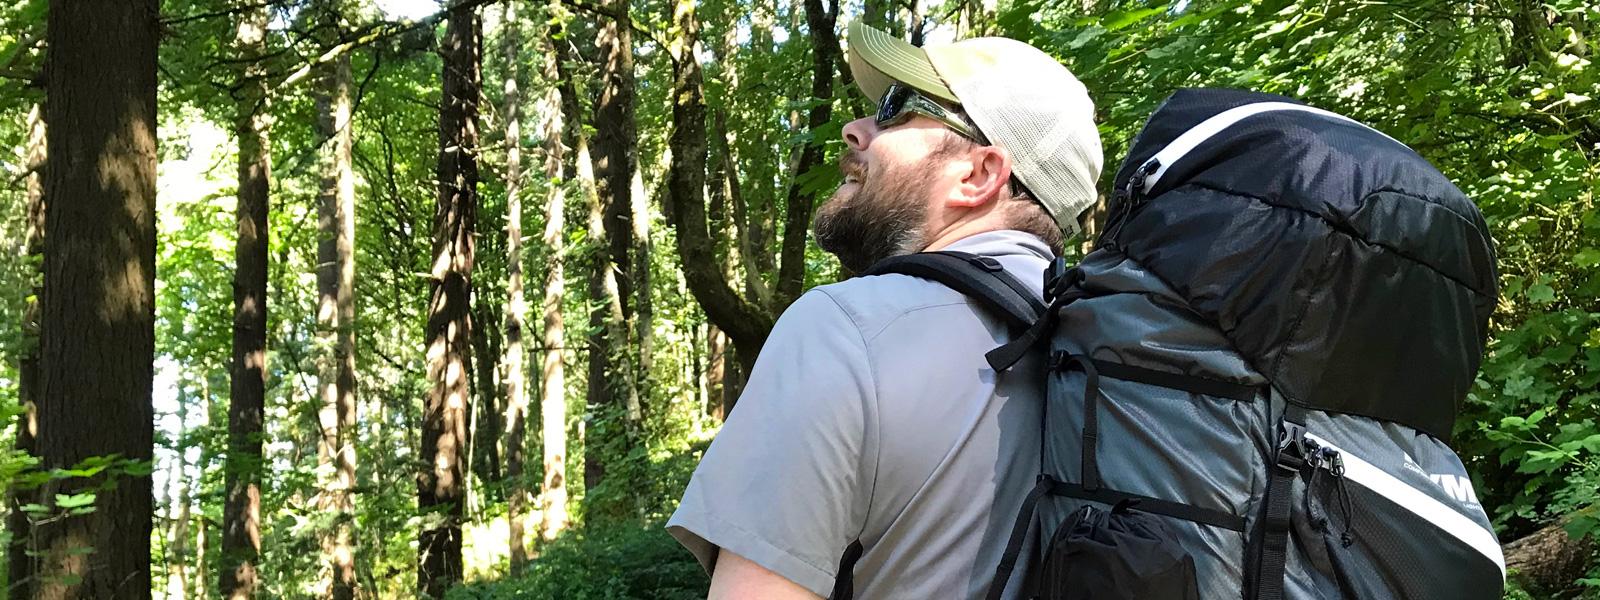 Hand Pump on Shoulder Straps Hiking Details about  /Klymit 60L Airframe Backpack